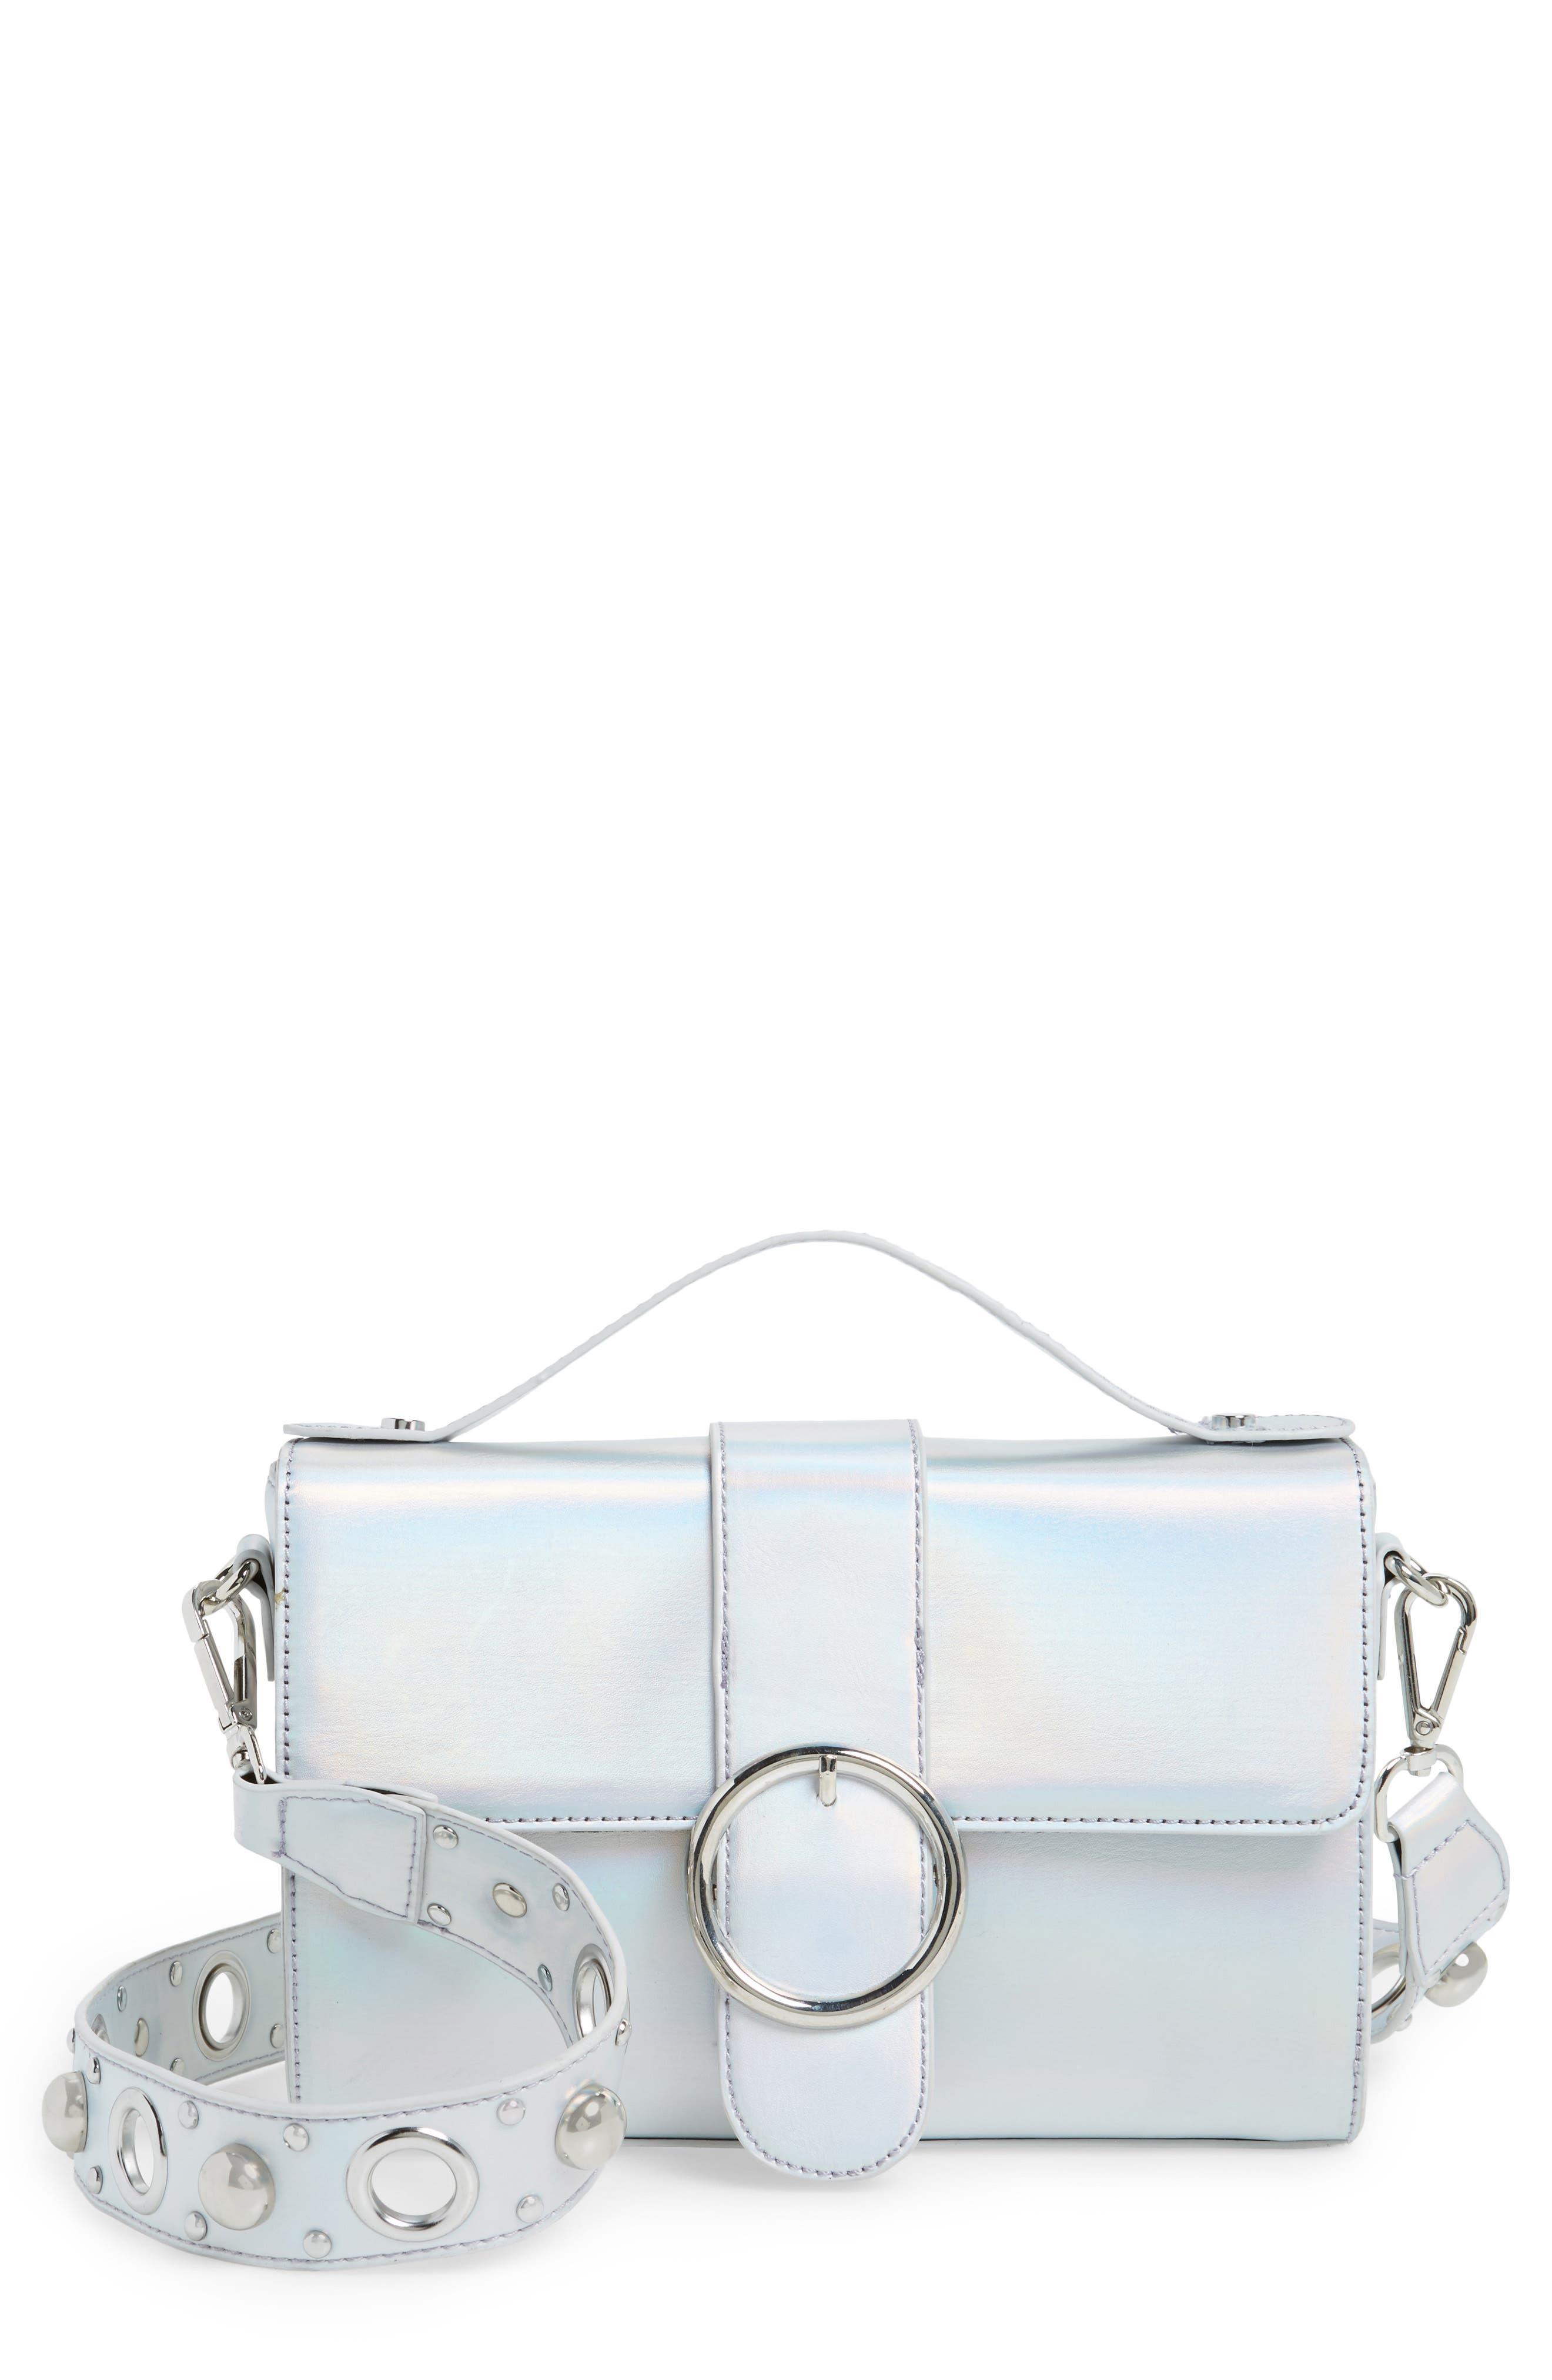 Studded Strap Crossbody Bag,                         Main,                         color, 040